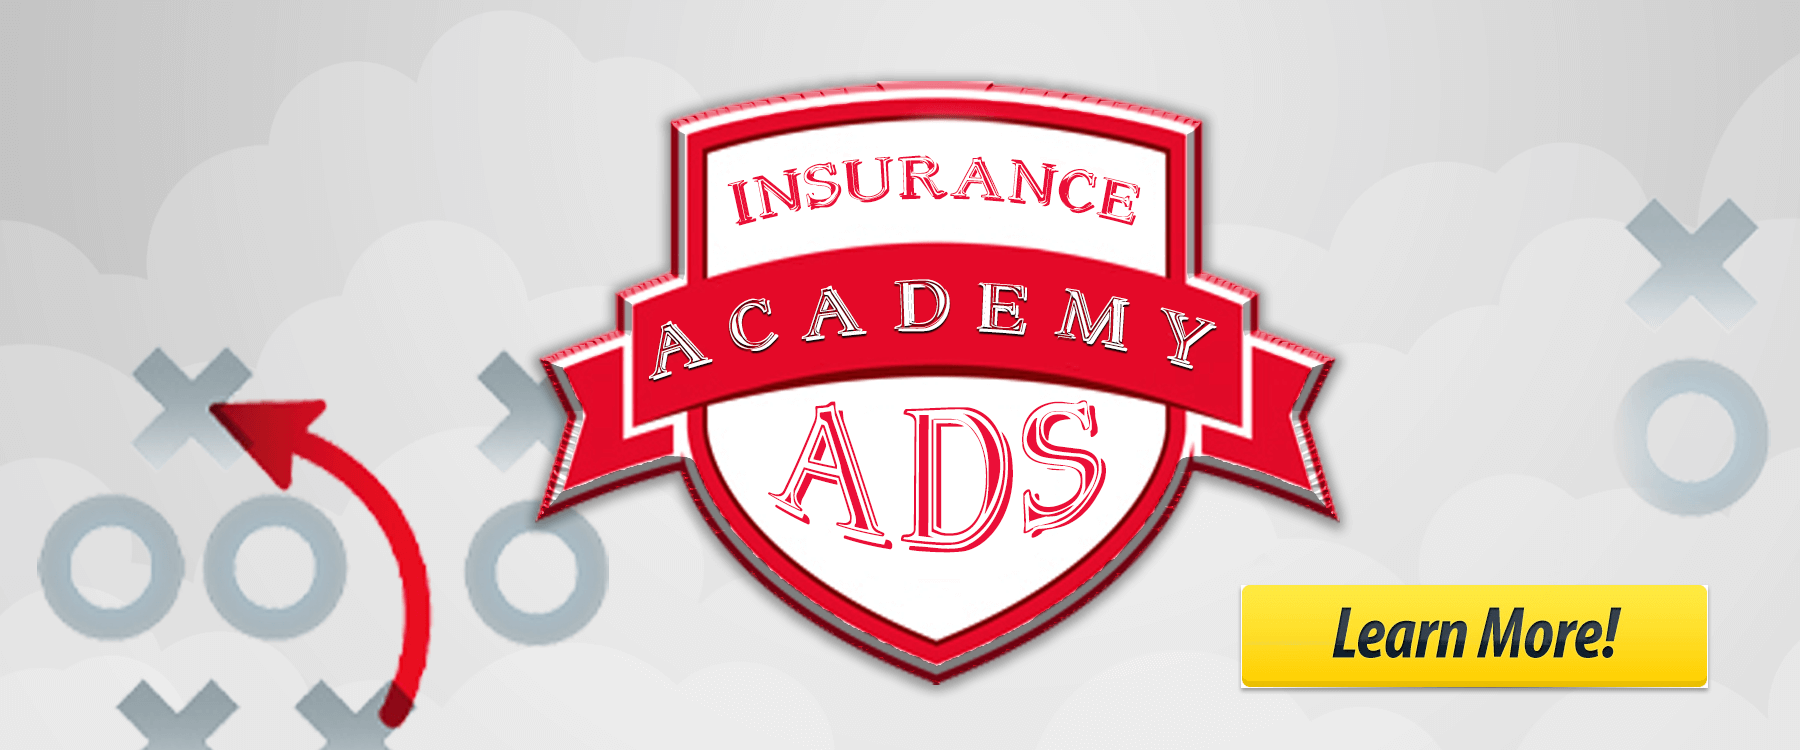 INS Ads Sales banner